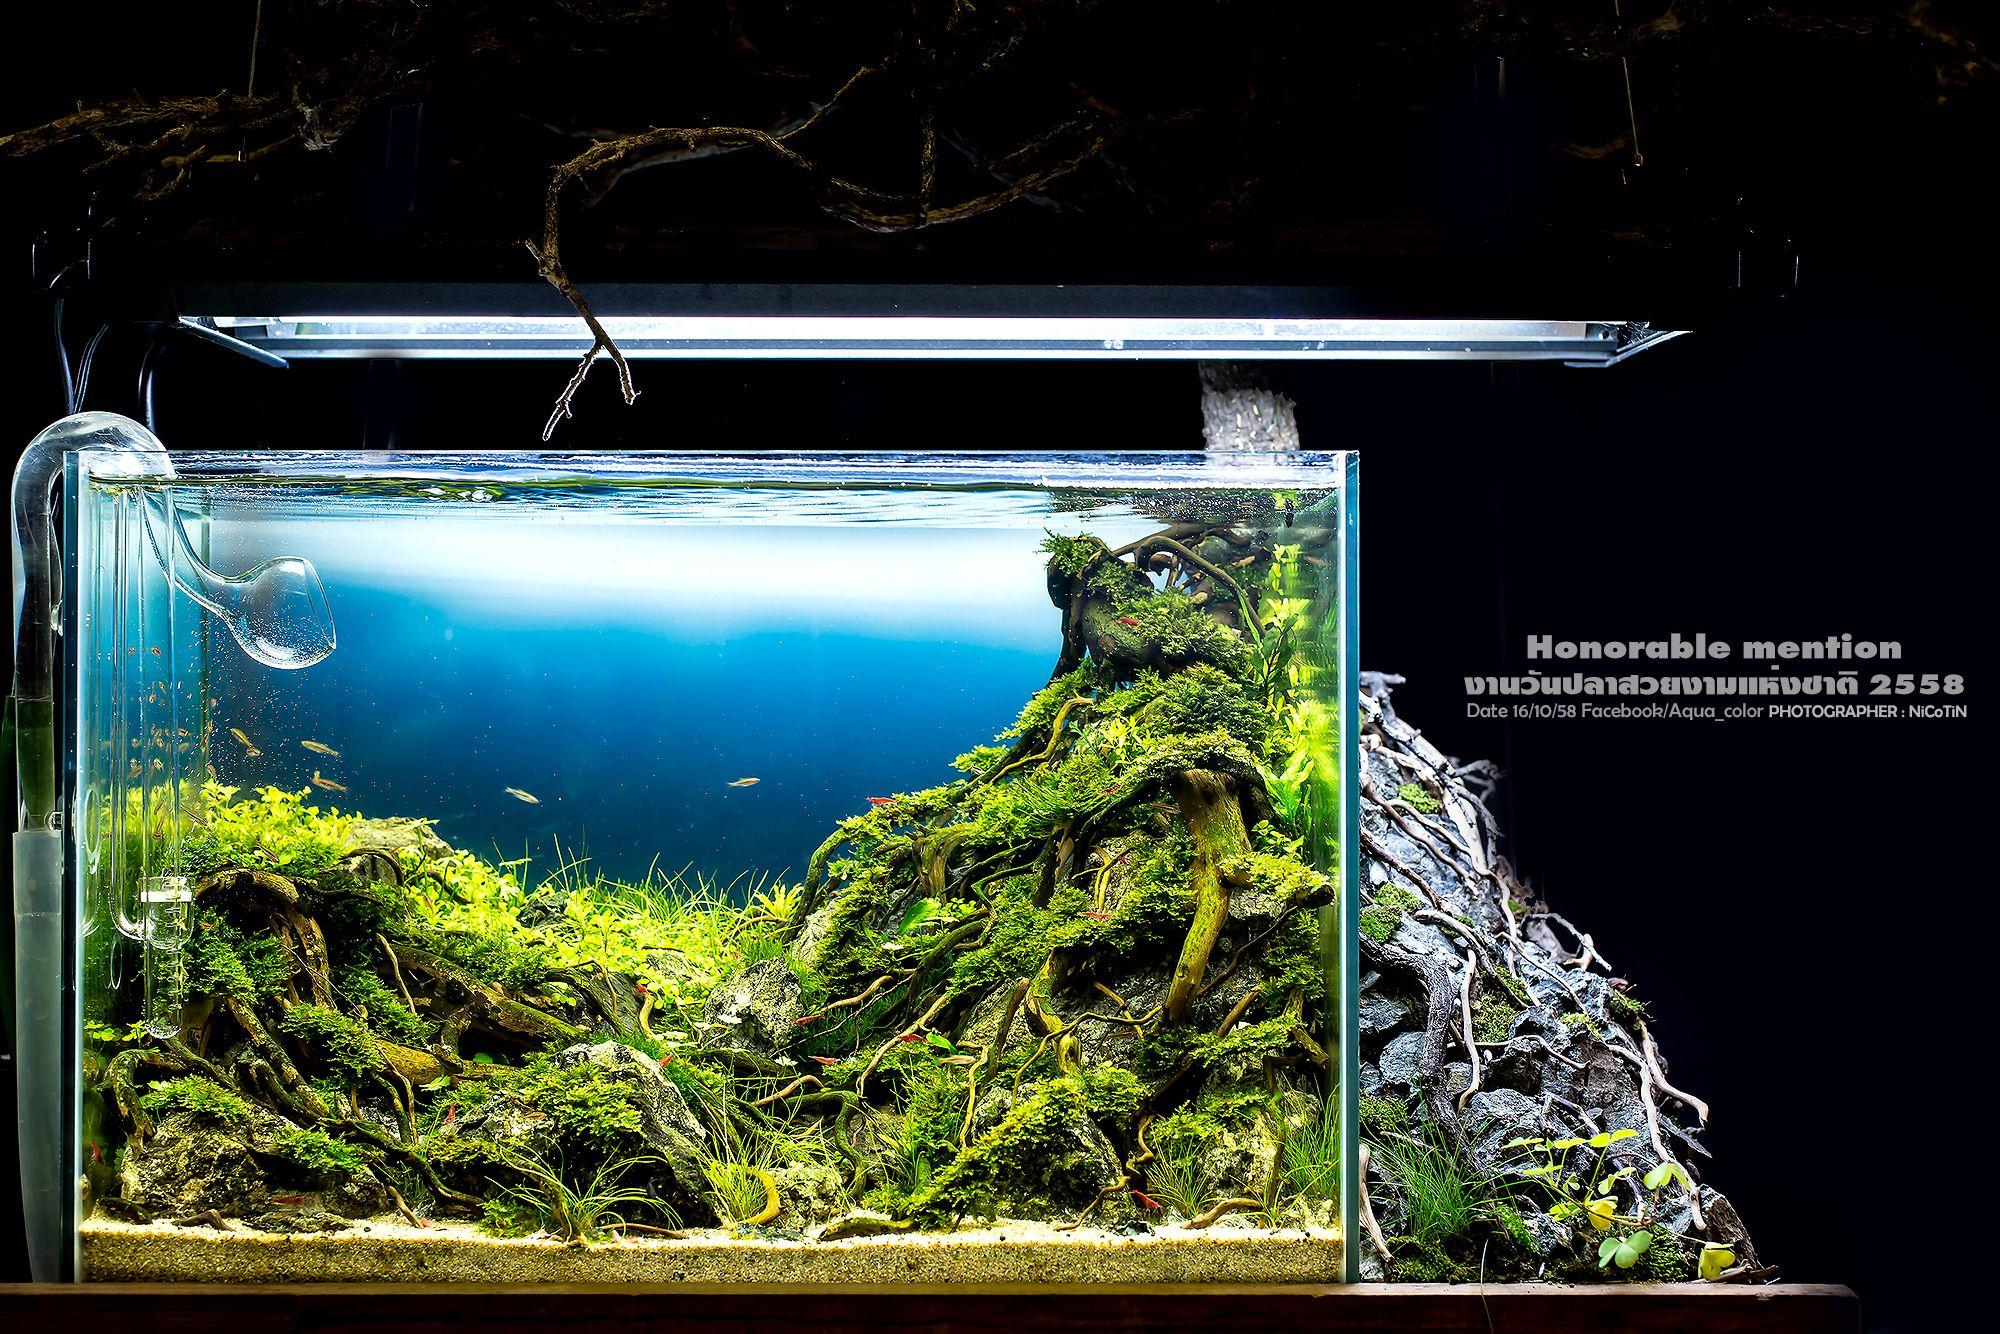 0d63e2d9393c8c881c3482227371c4ce Luxe De Crevette Aquarium Des Idées